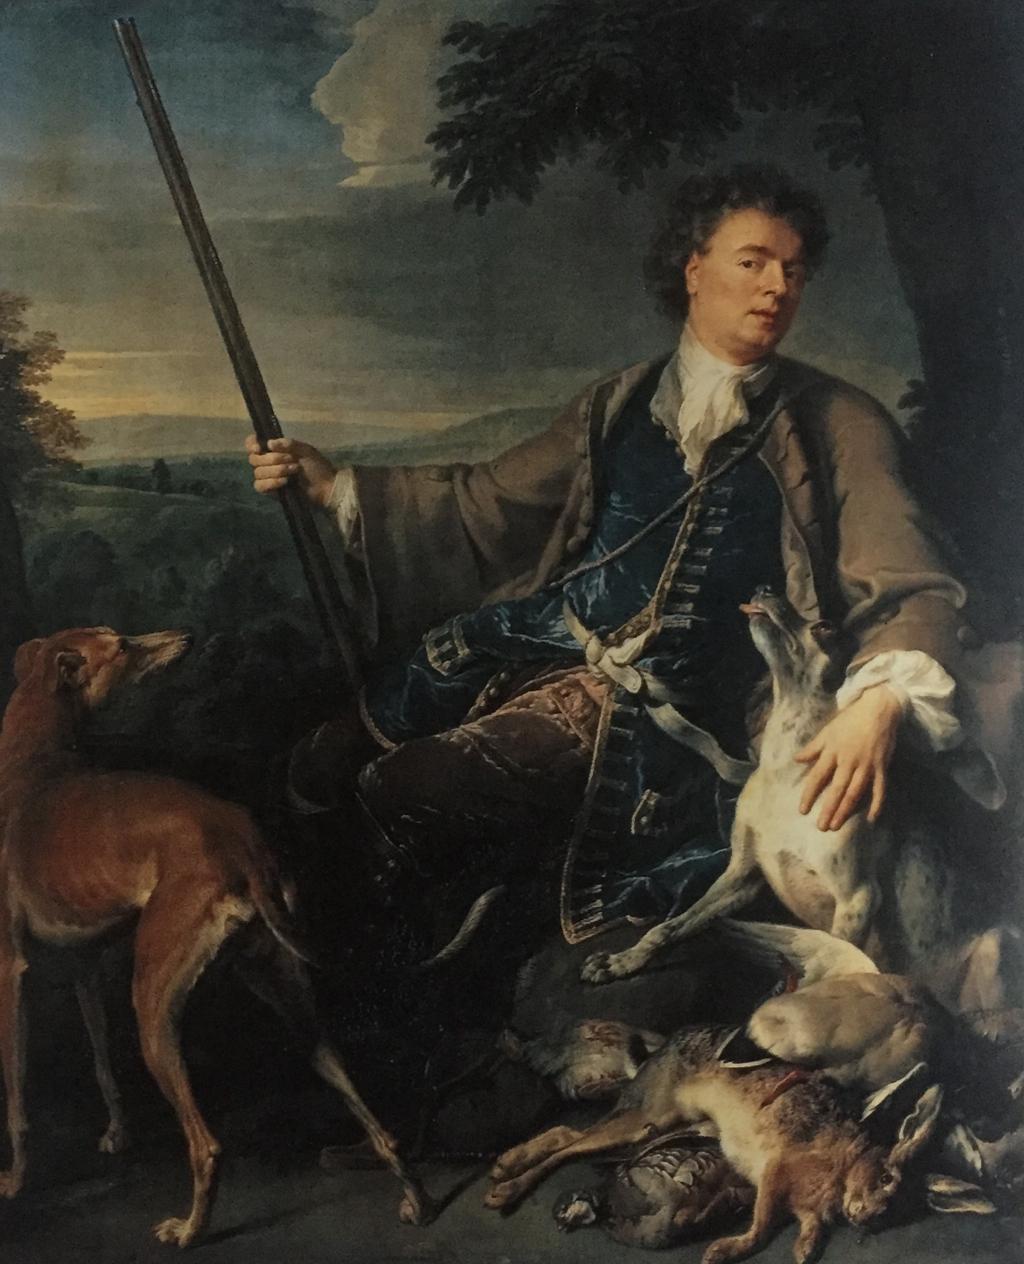 autoportret jako myśliwy;Alexandre-Francois Desportes 1661-1743